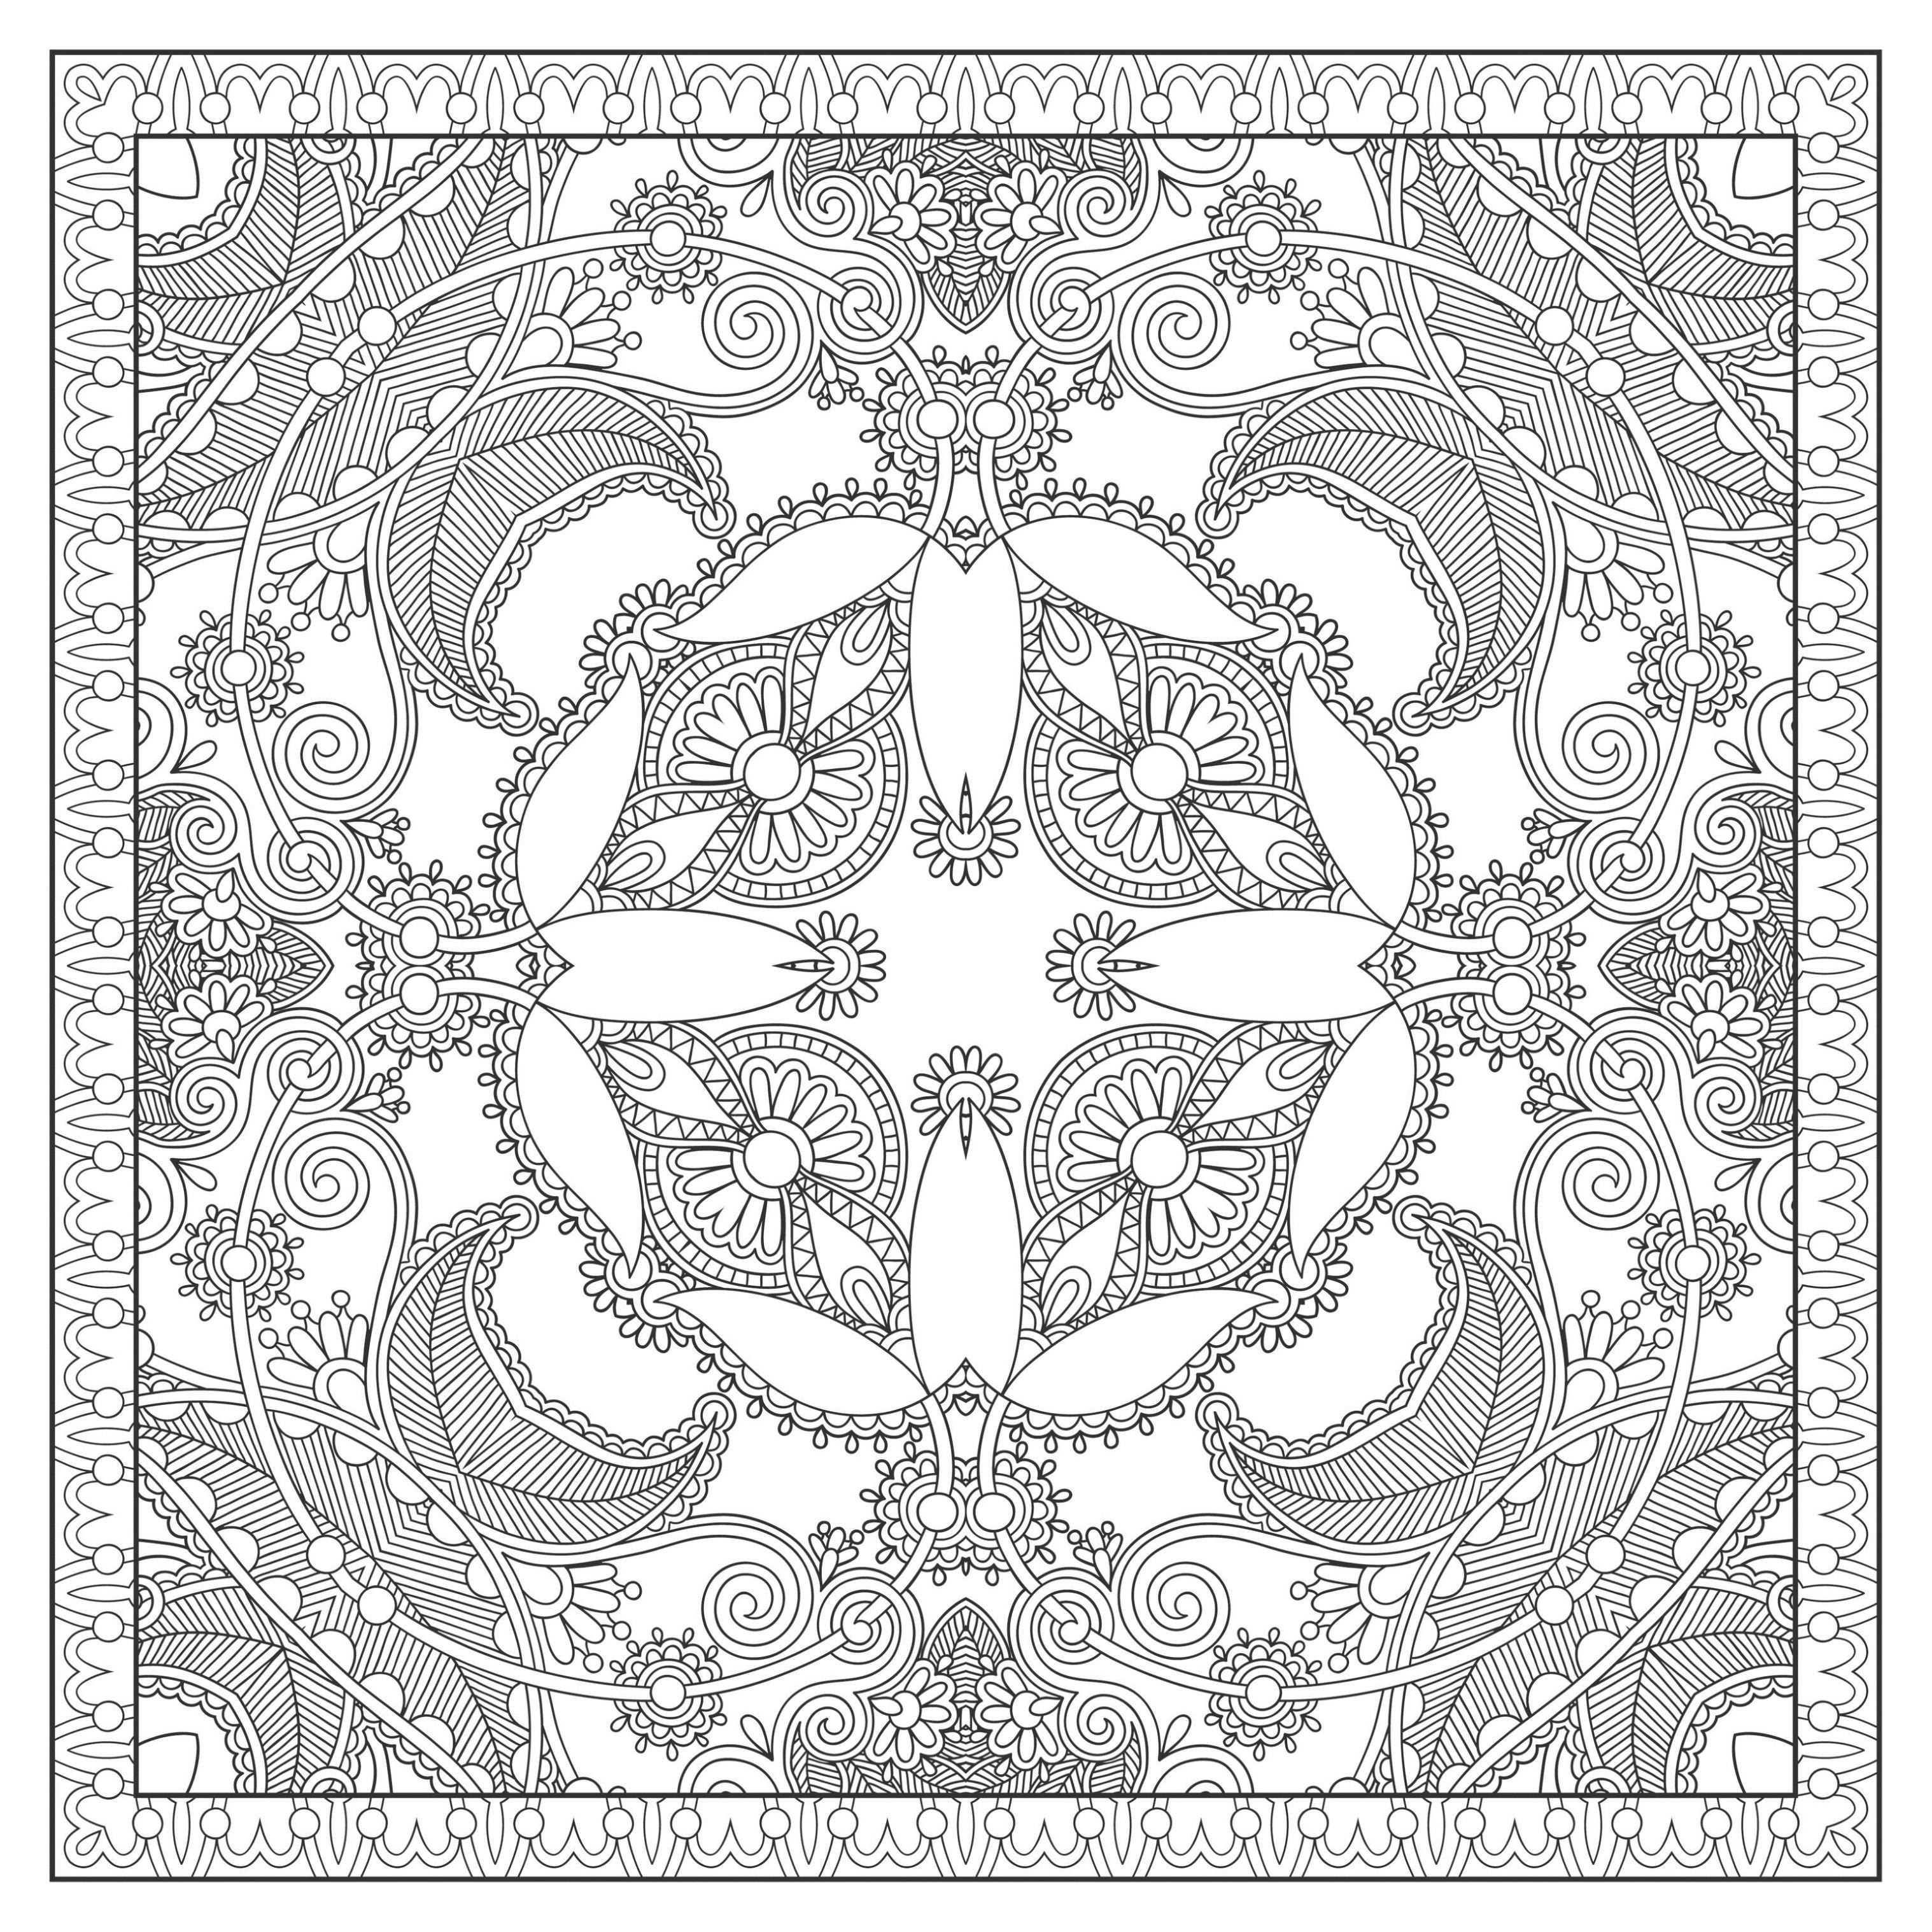 Colorear para adultos : Mandalas - 73